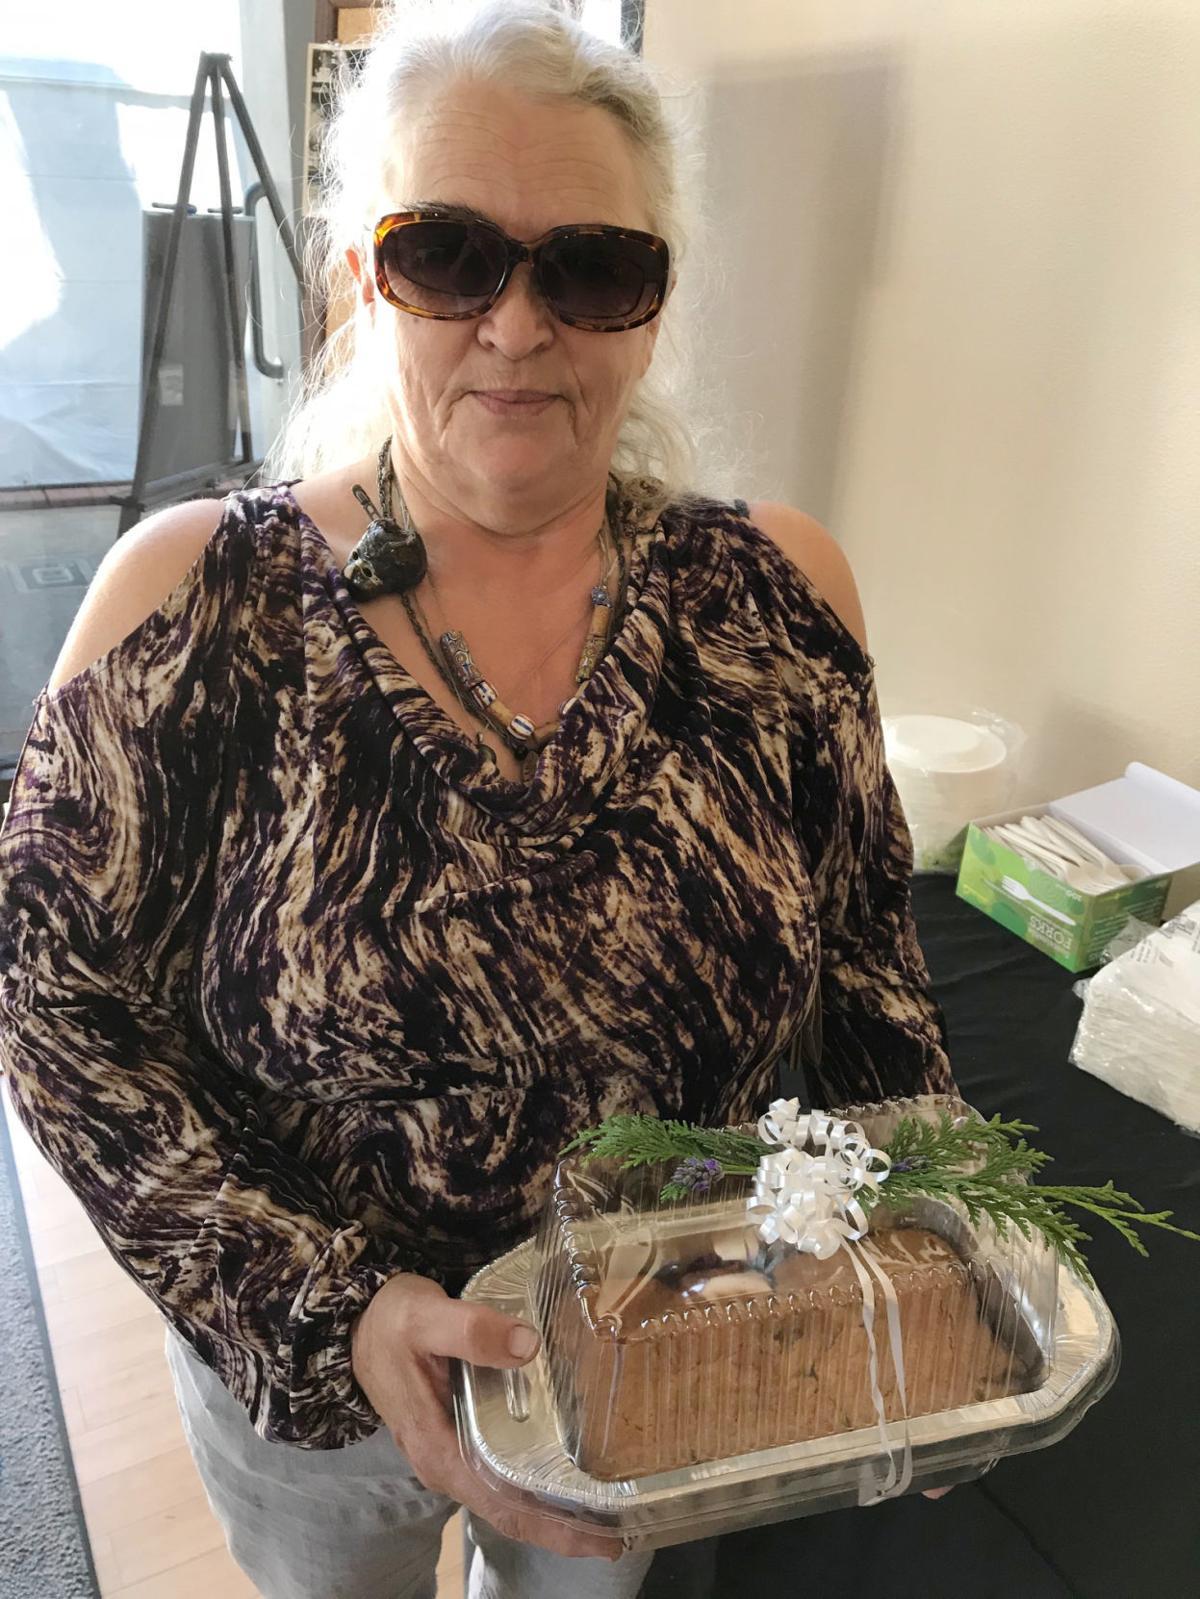 1 Nancy Grayson, blackberry cobbler